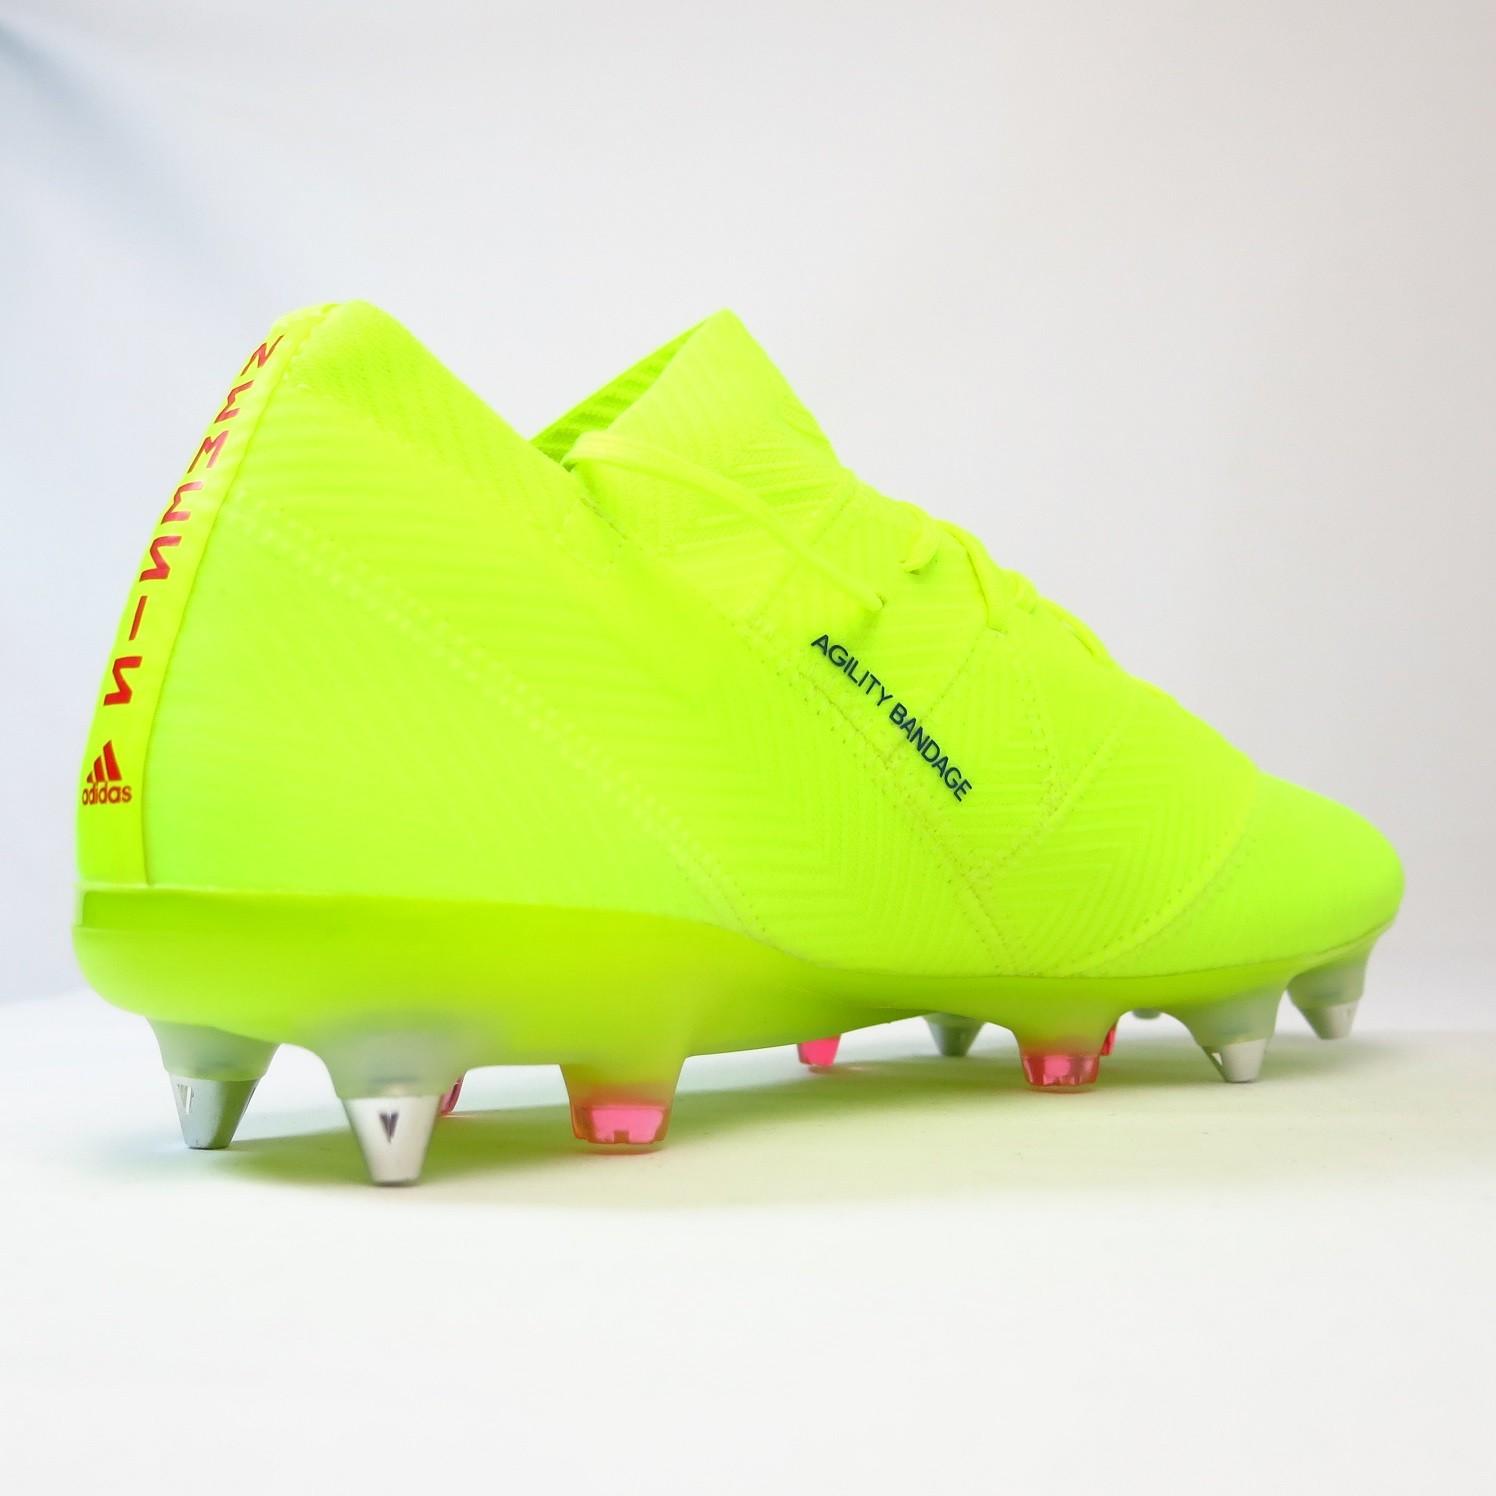 Adidas Nemeziz 18.1 SG PRO - Trava Mista